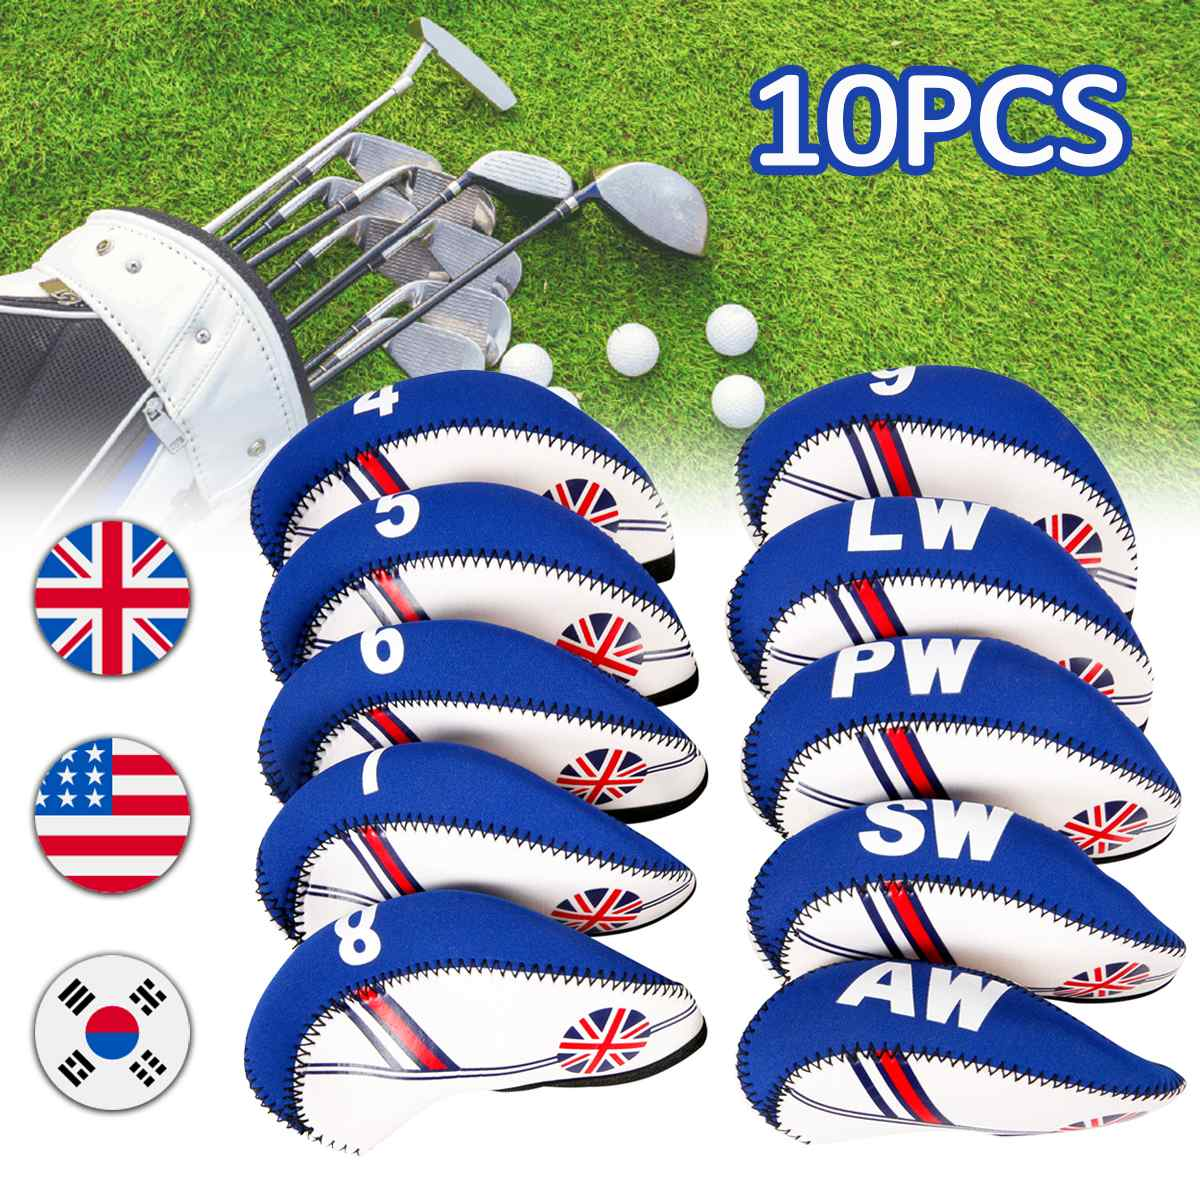 10Pcs/set Golf Club Iron Head Cover Neoprene National Flag Headcover Waterproof Golf Club Head